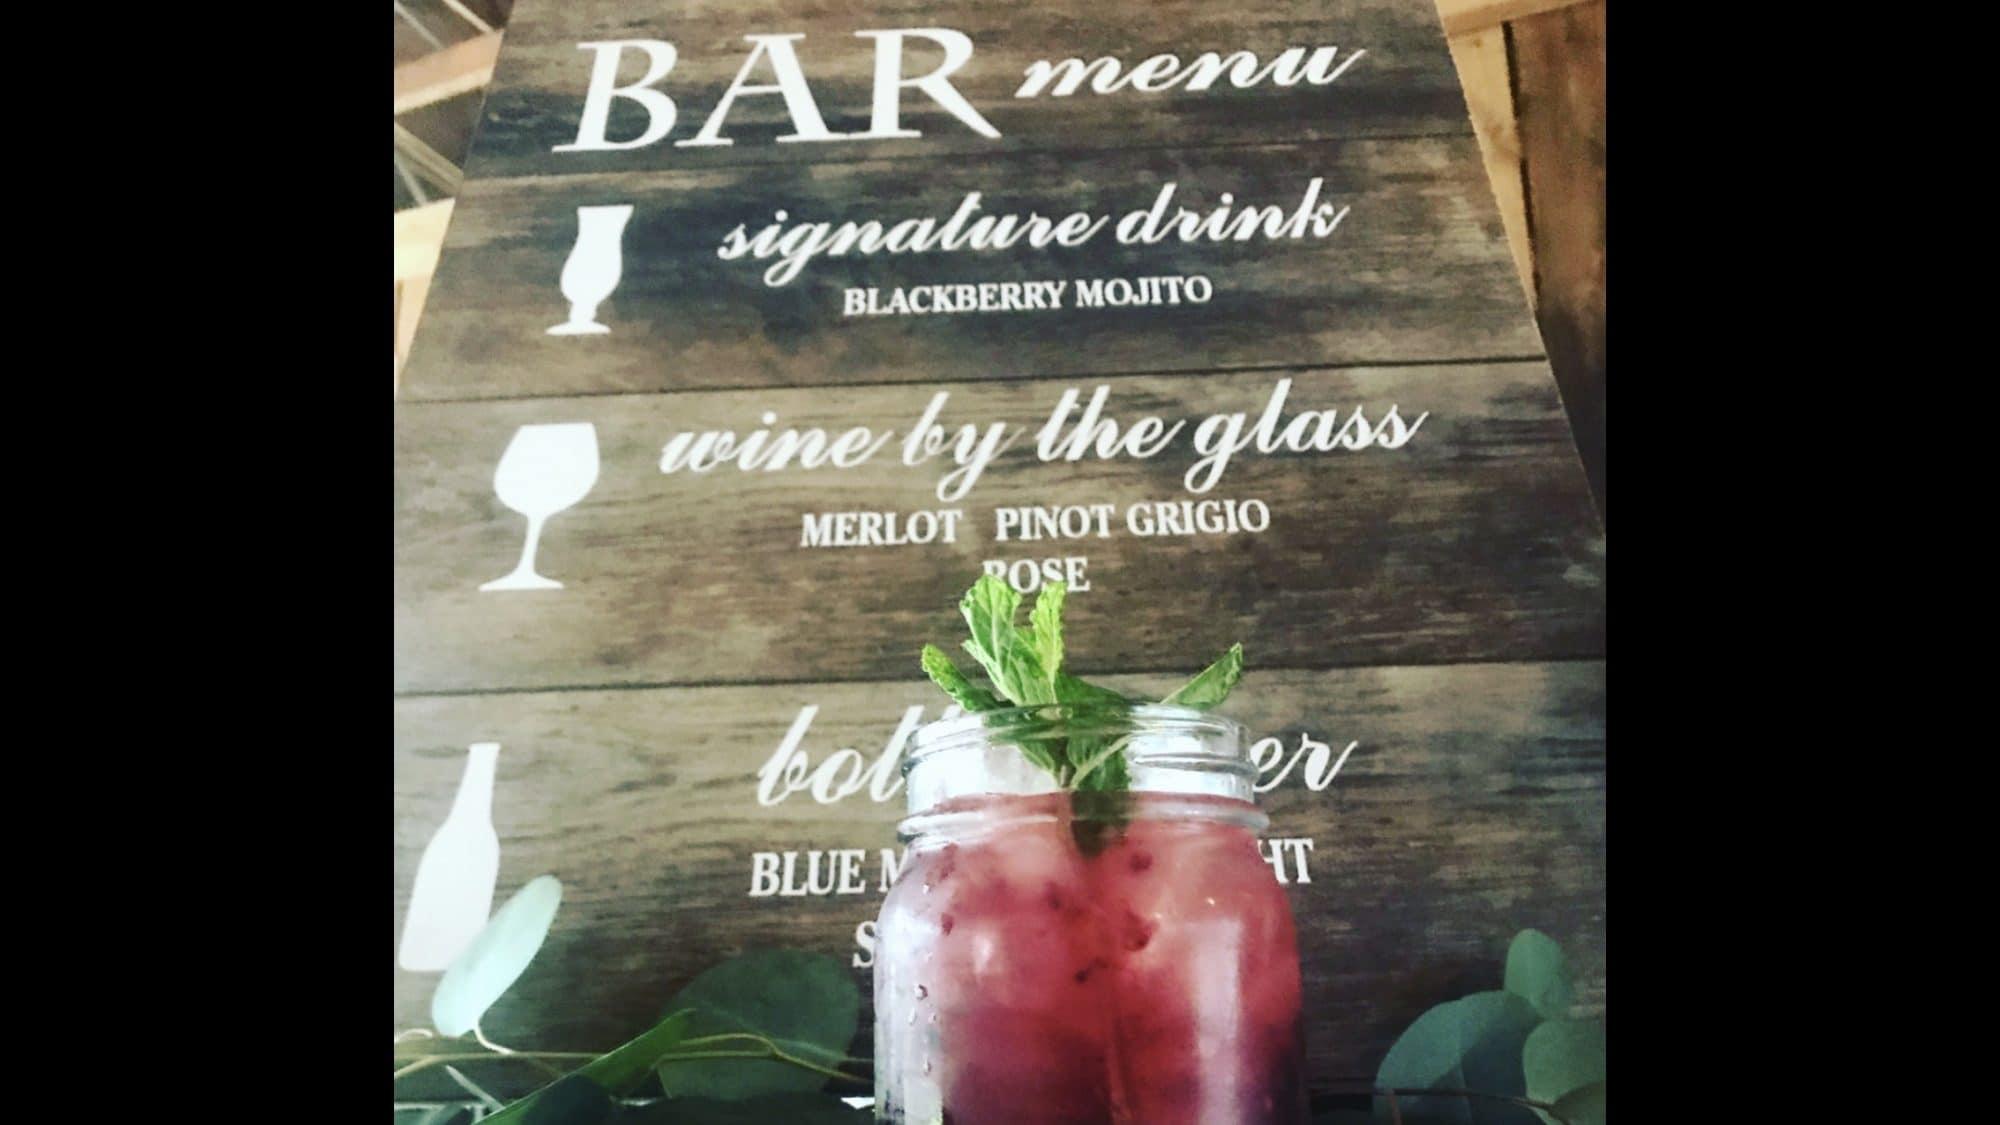 Bar-tini Orlando - customized rustic bar menu